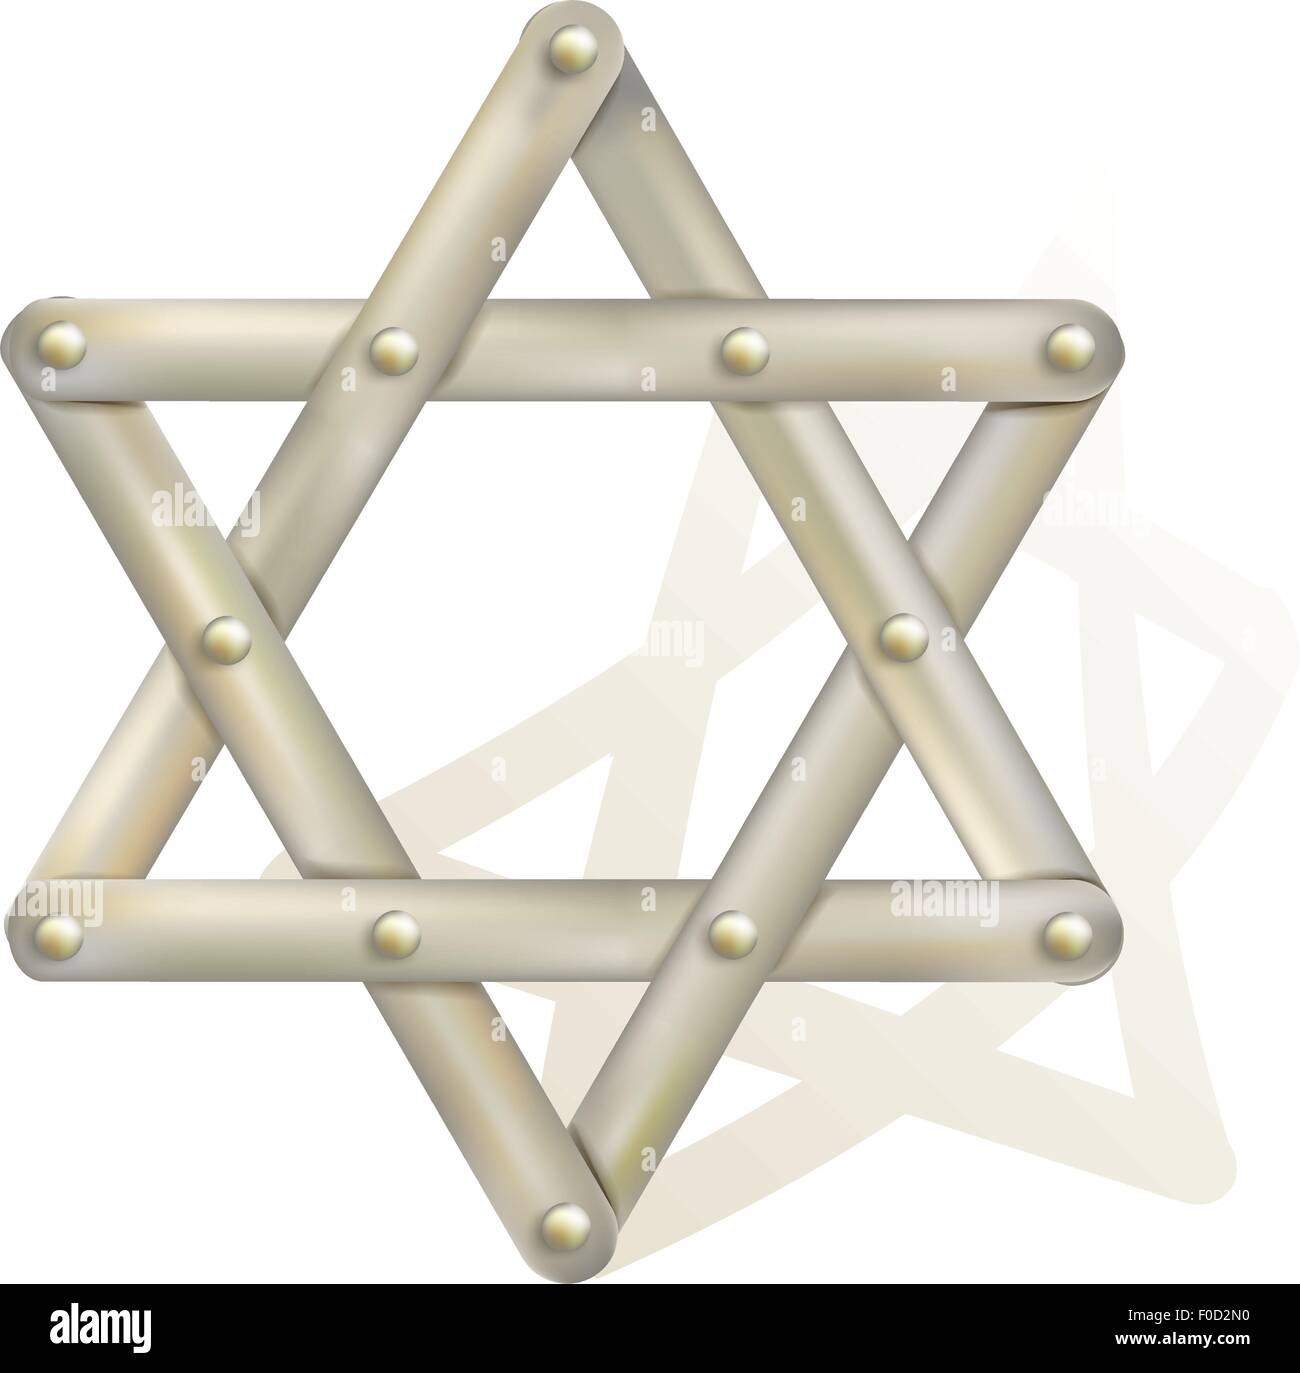 metallic star of David as symbol of judaism - Stock Image